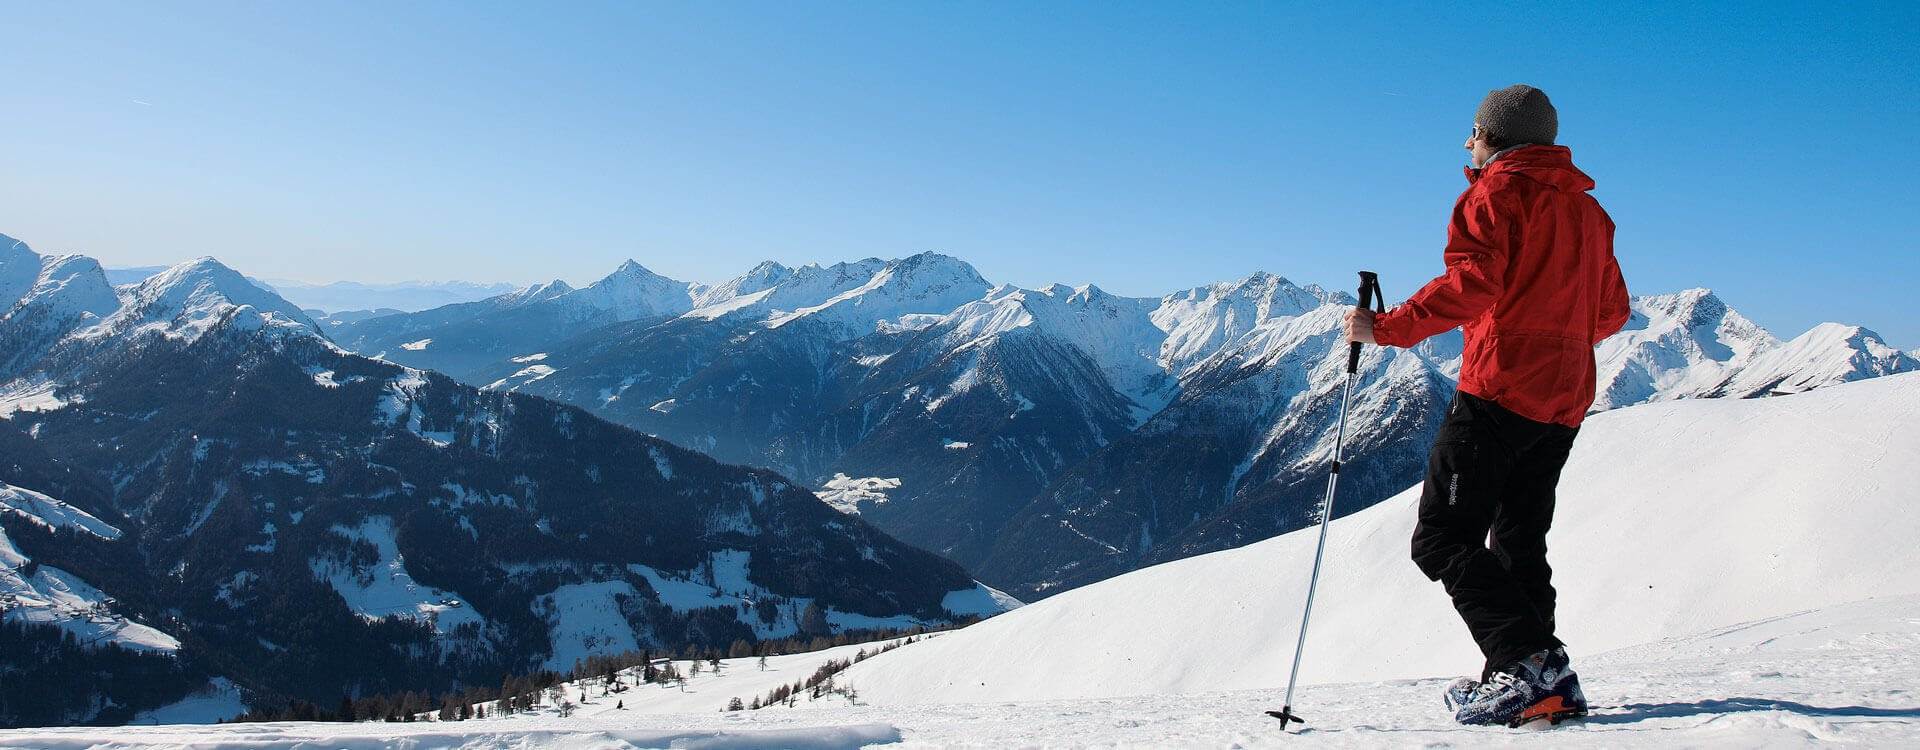 winterurlaub-passeiertal-suedtirol-5